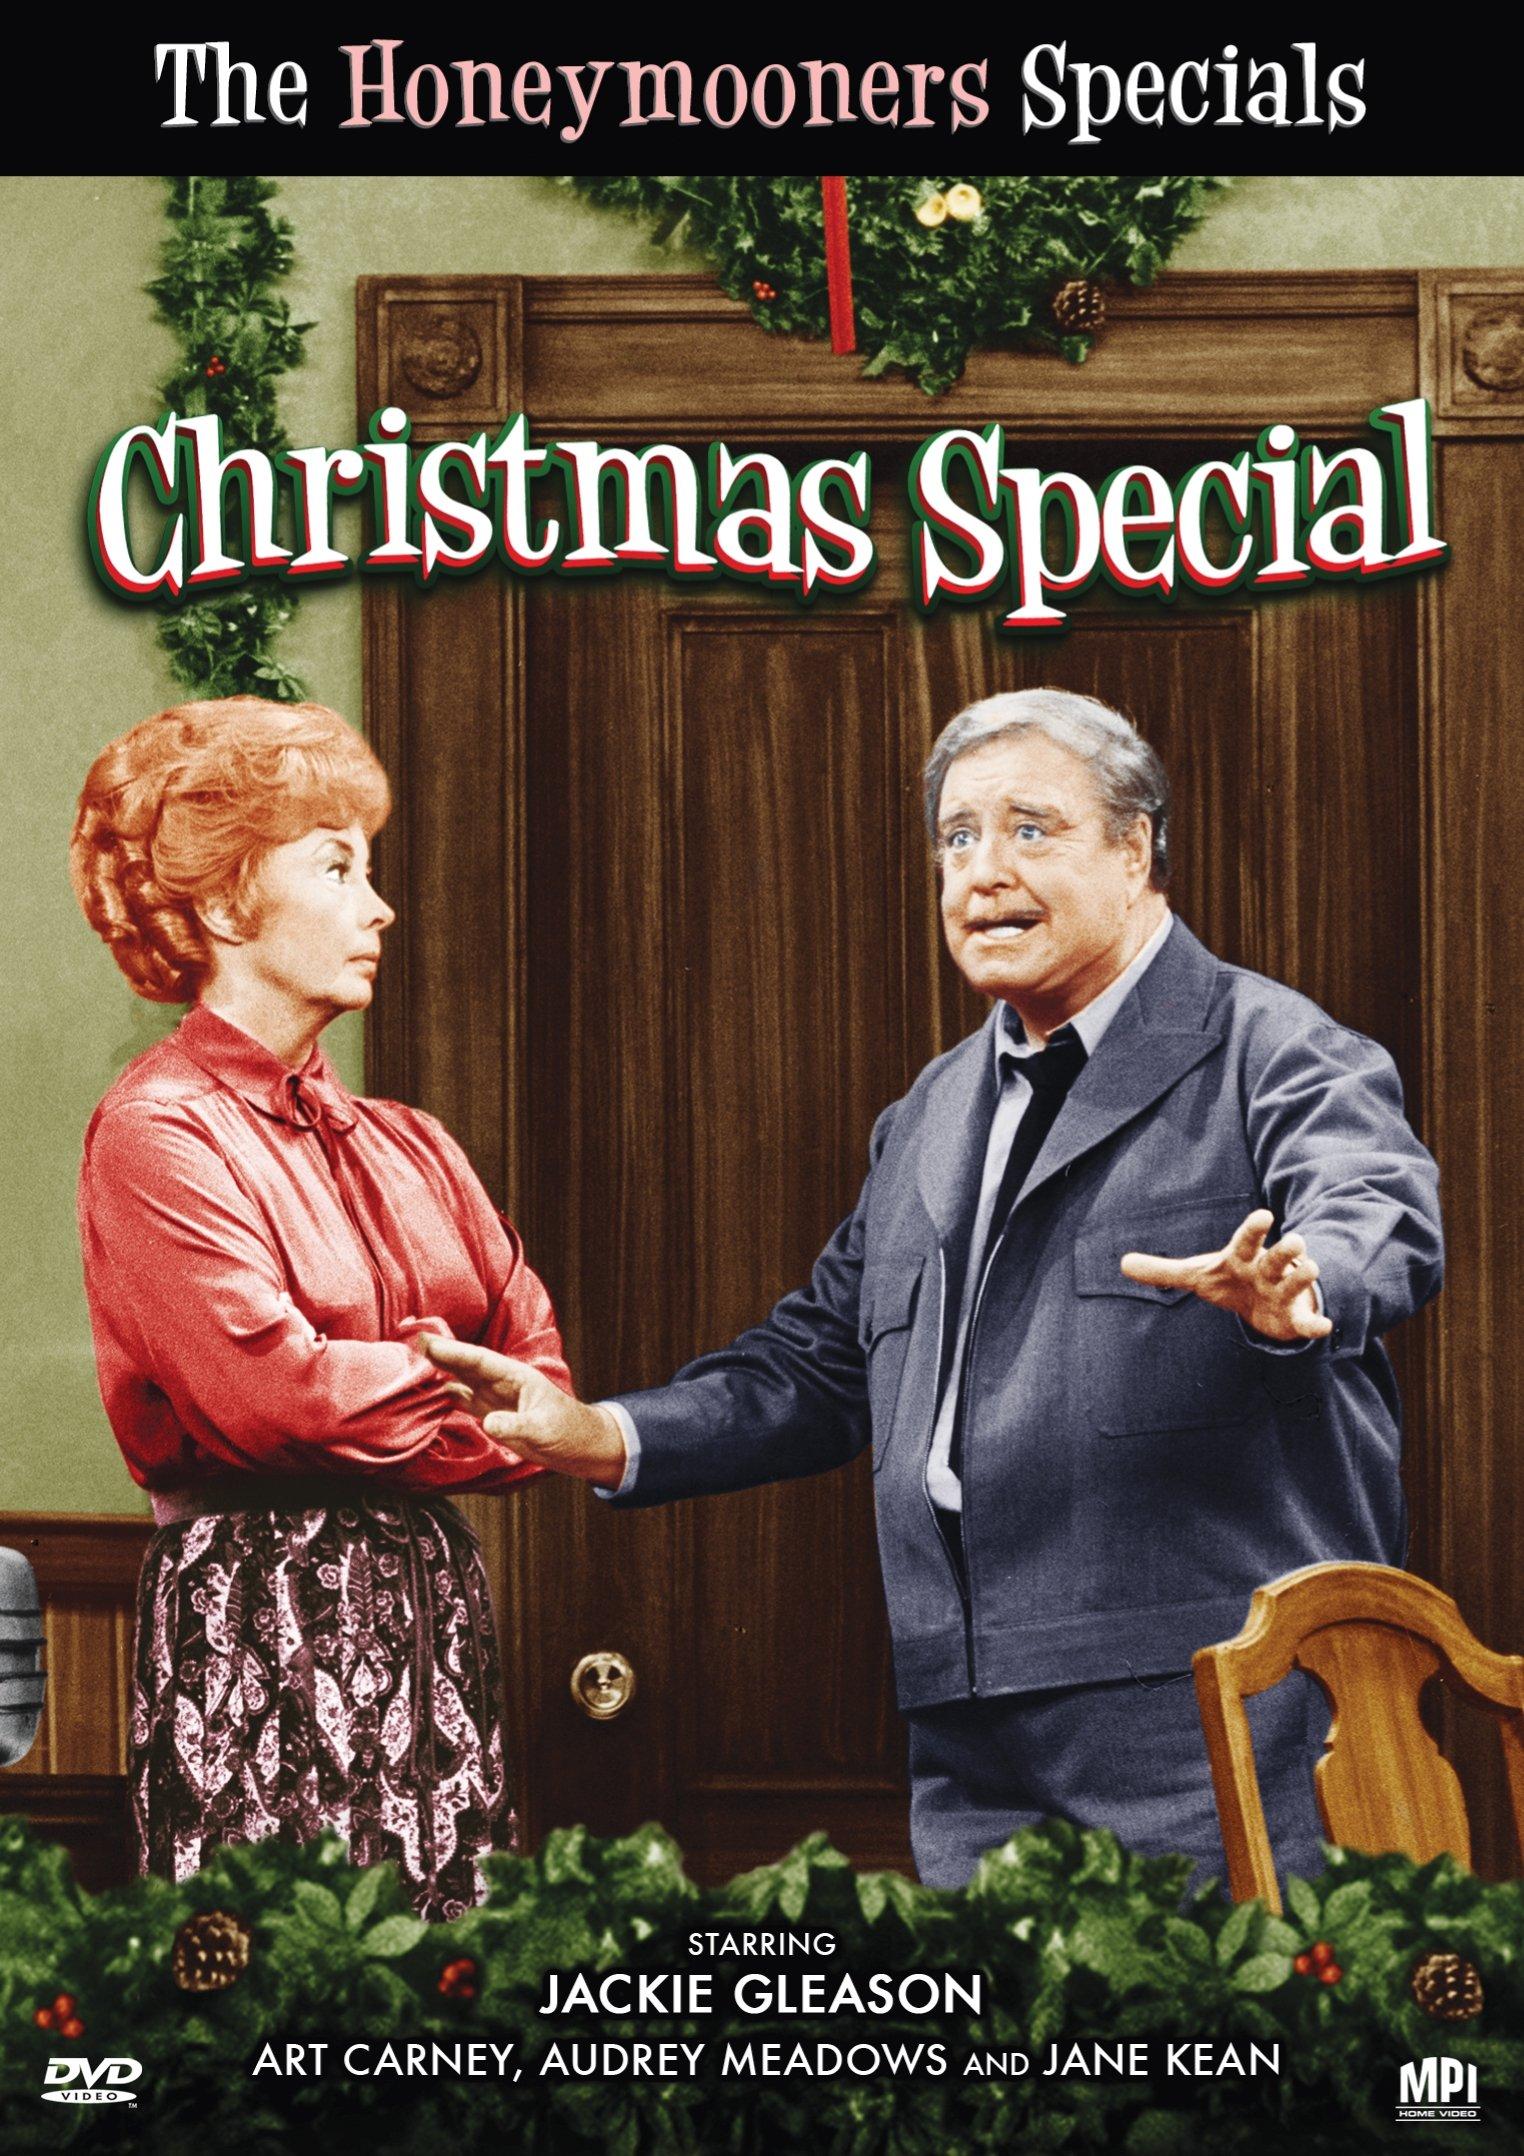 The Honeymooners Specials: Christmas Special (DVD)